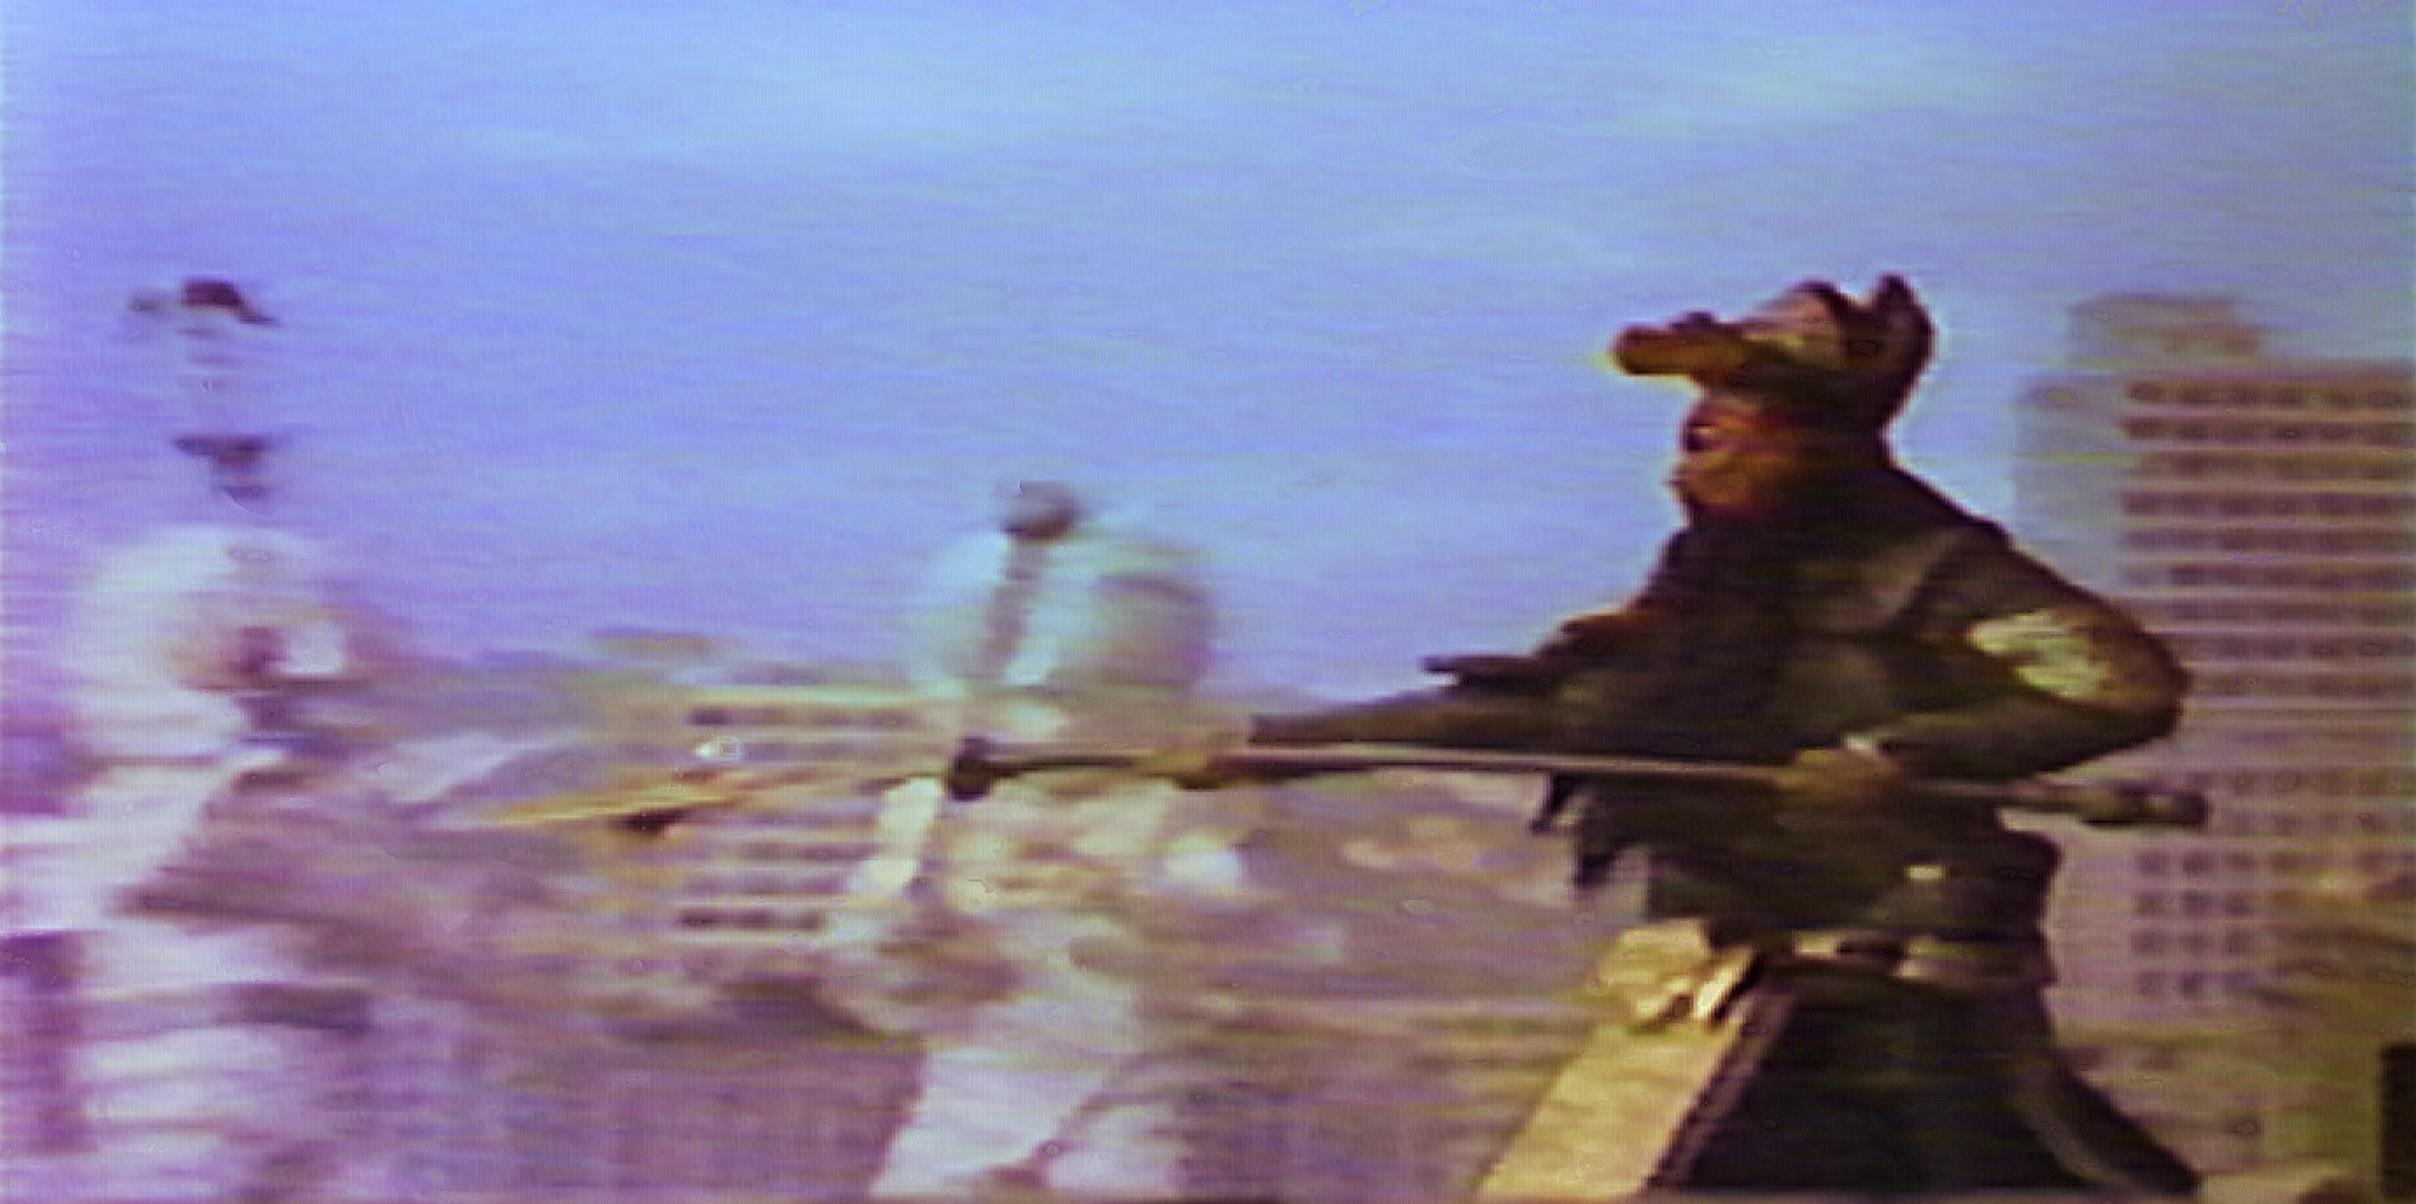 《關公大戰外星人》(Gwan Gung Vs Aliens Remaster, 1976)